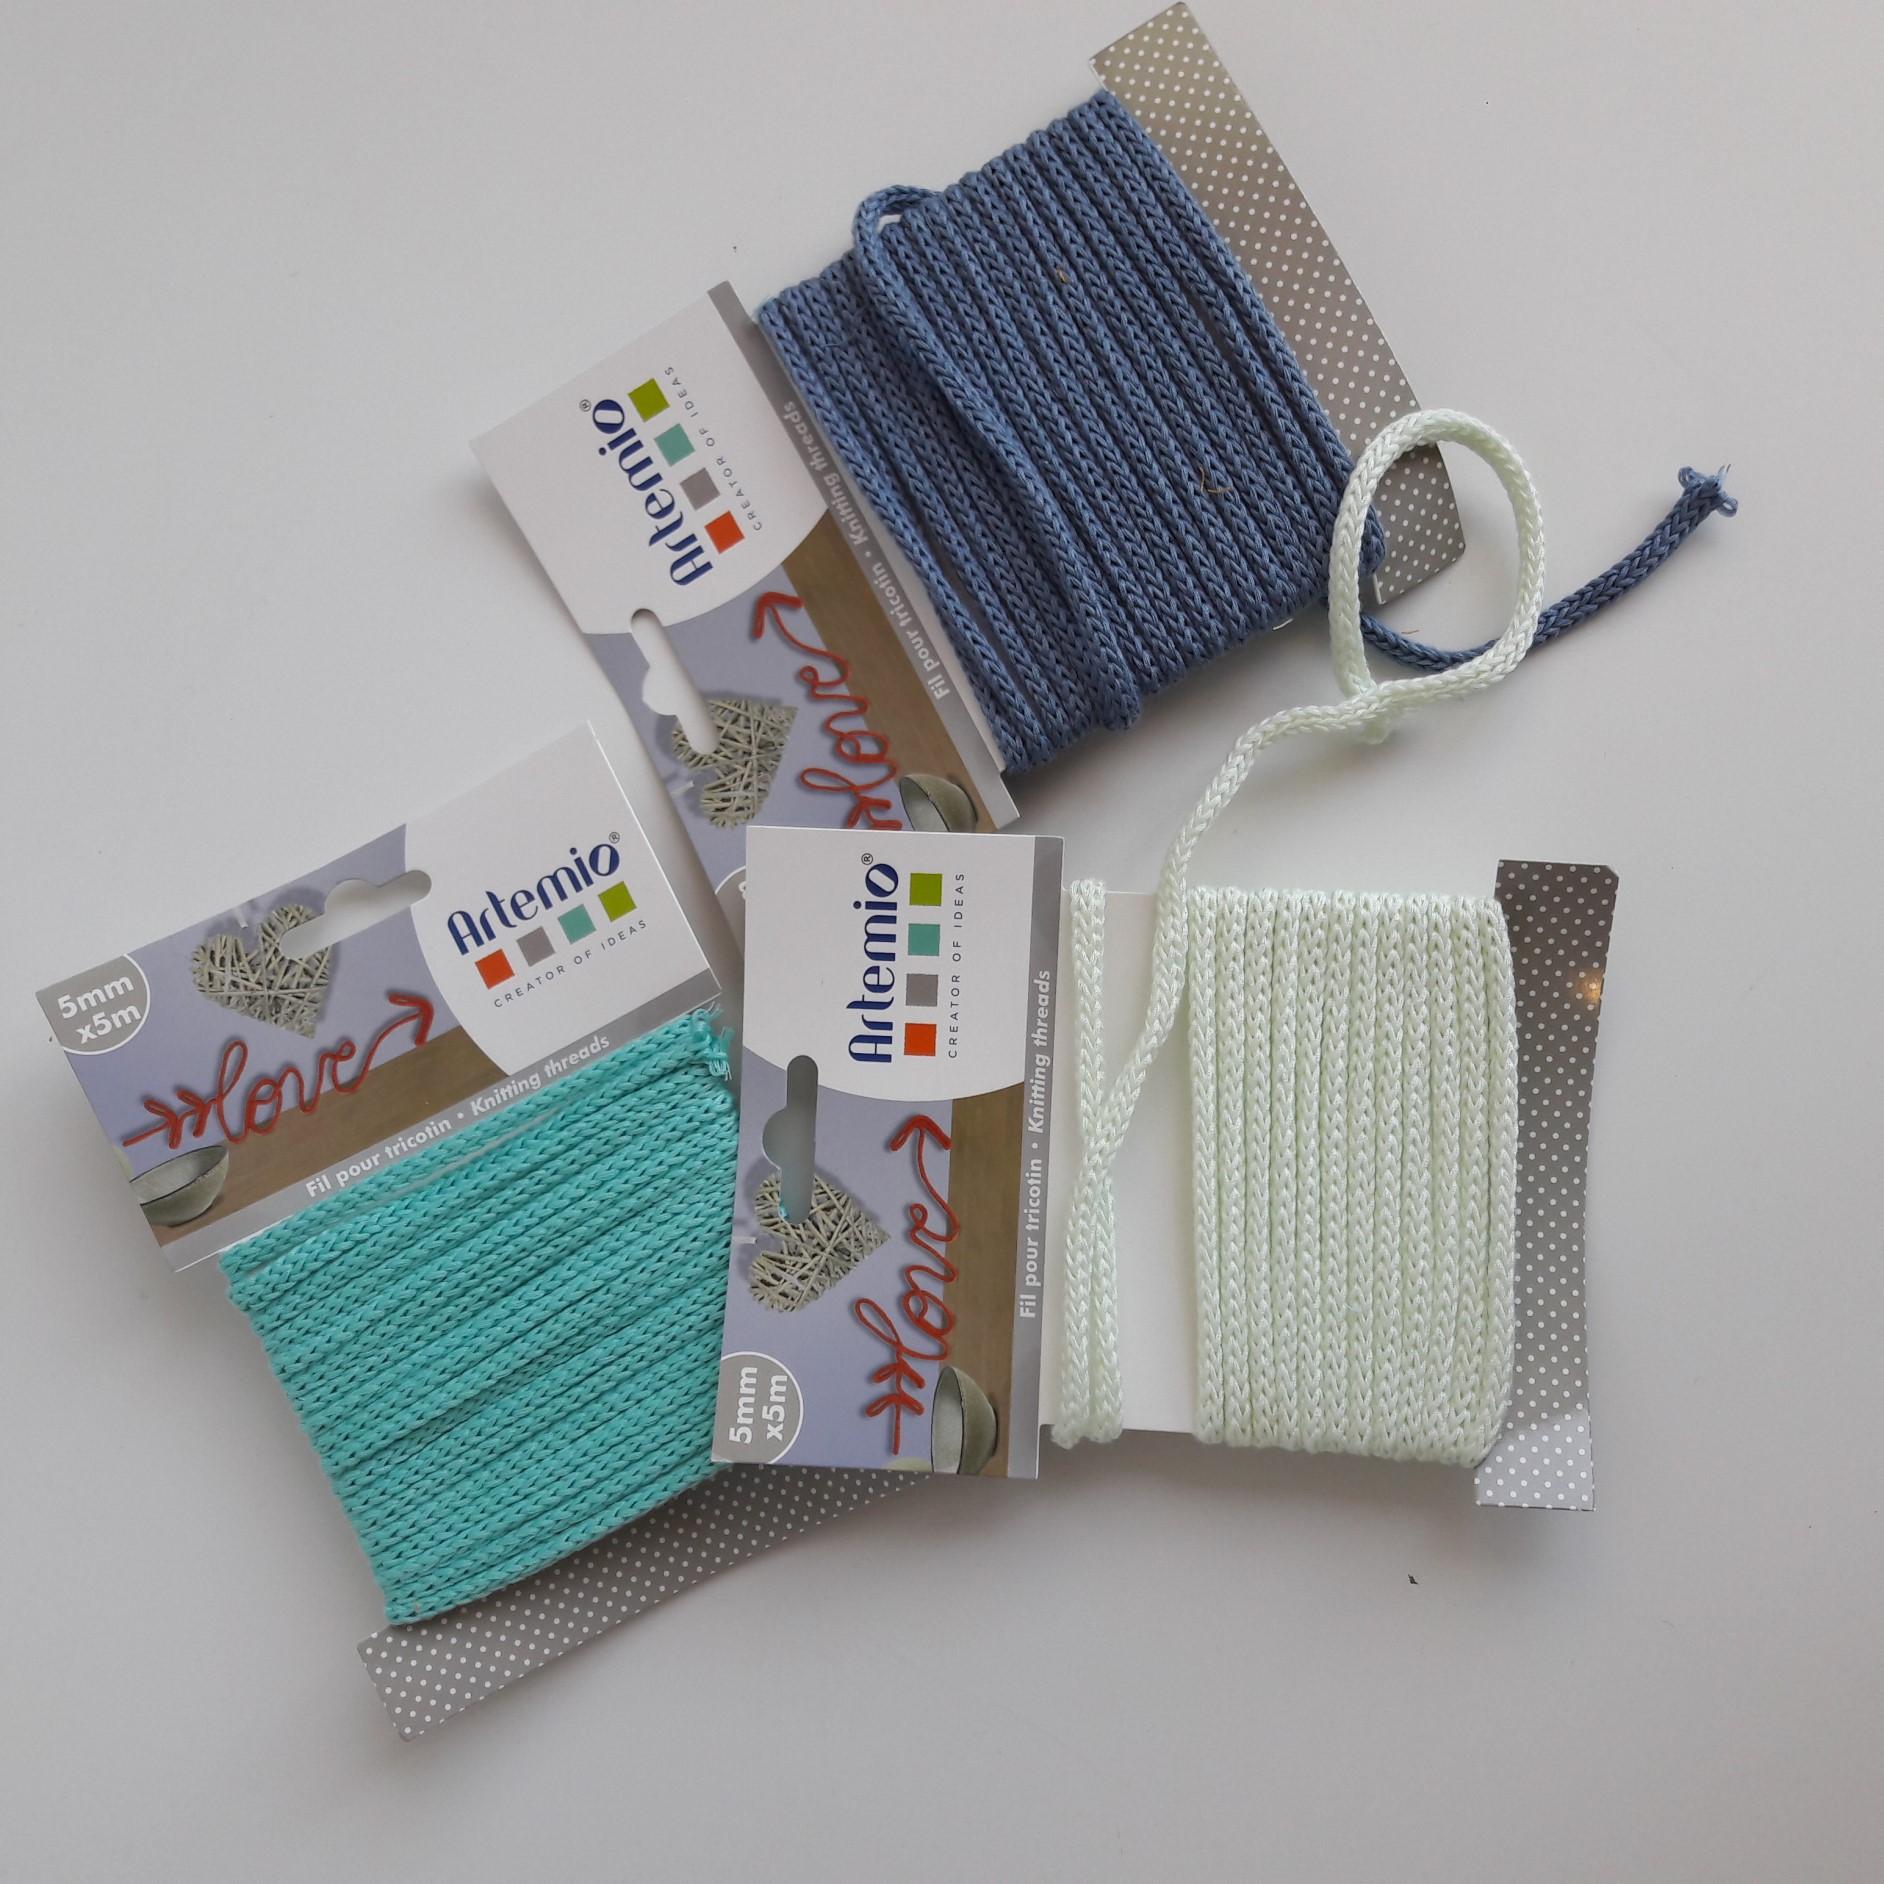 artemio fil tricotin polyester bleu sarcelle 5mmx5m pas cher z dio. Black Bedroom Furniture Sets. Home Design Ideas